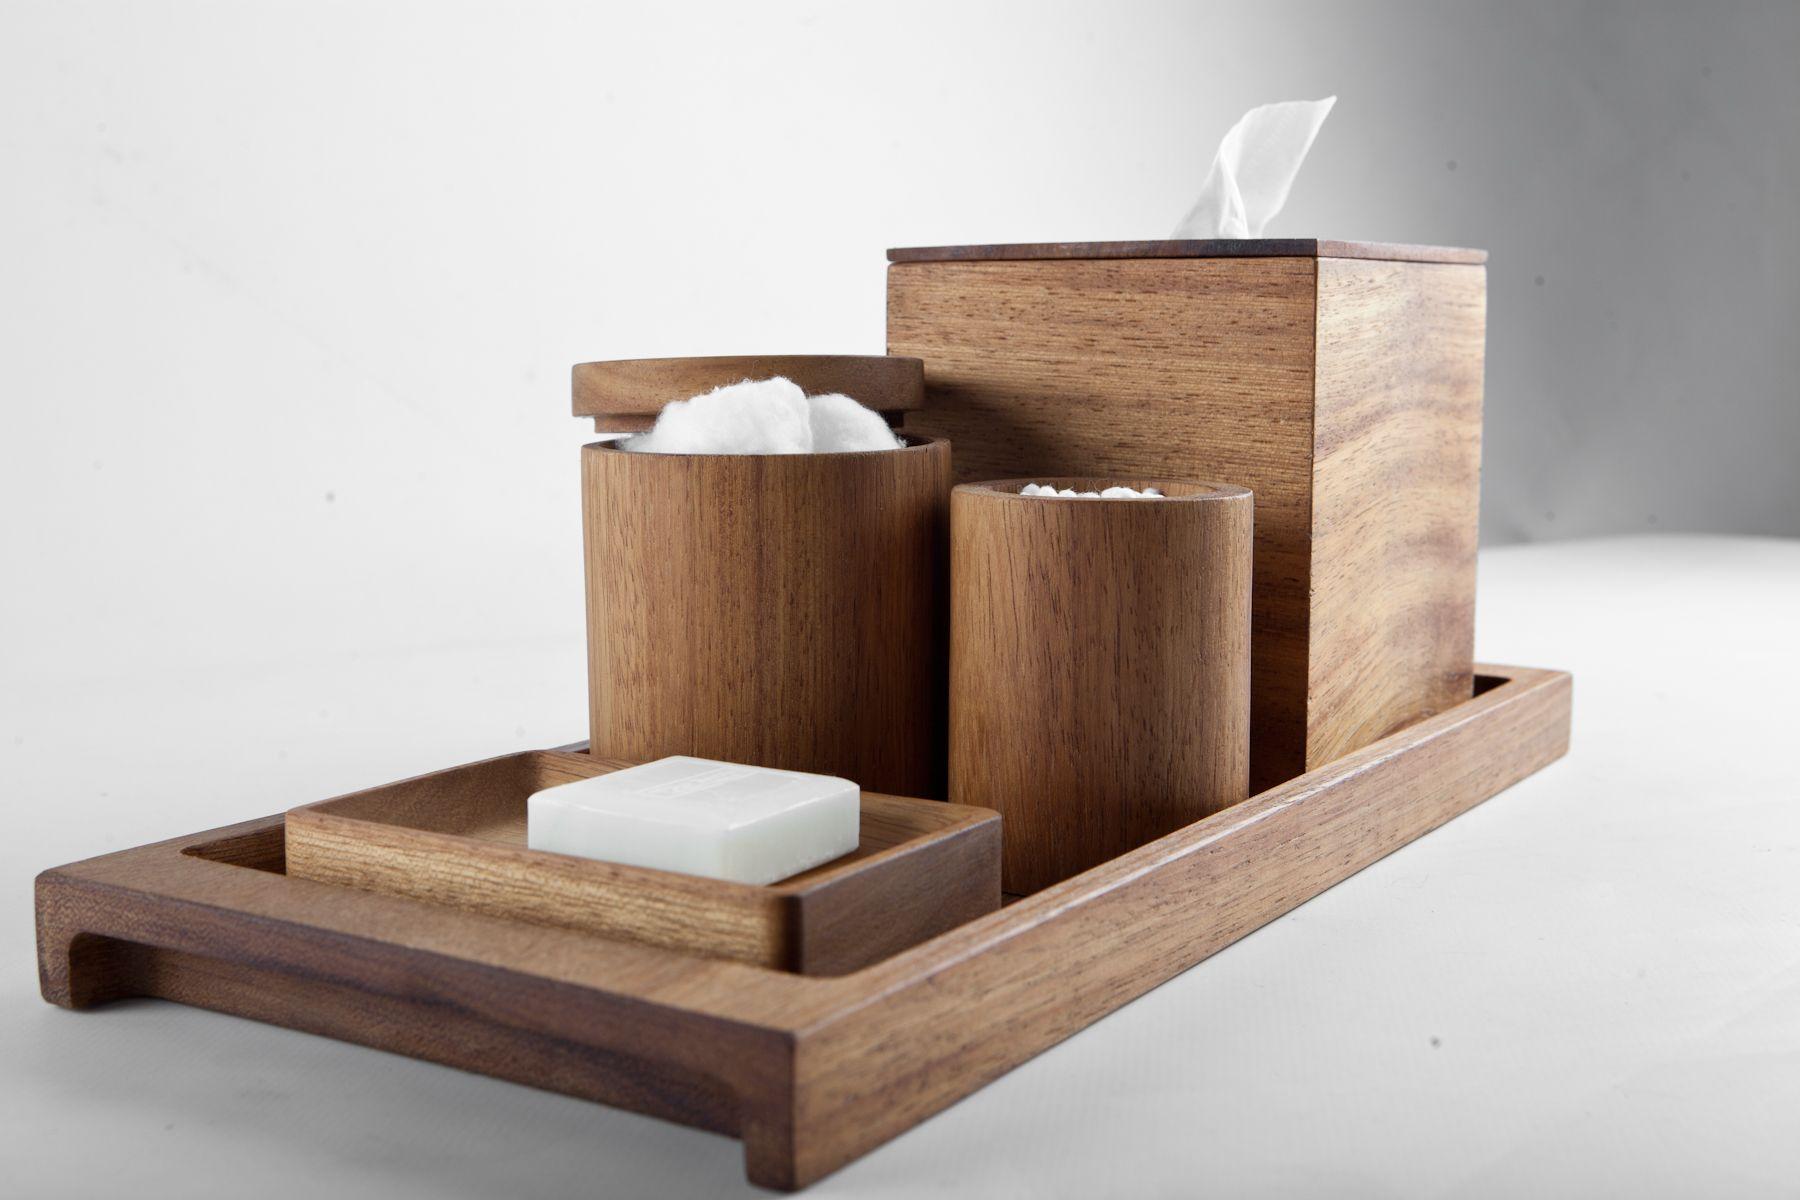 Pin By Vorajuk Temprome On Bathroom Collection Bathroom Accessories Modern Bathroom Wooden Bathroom